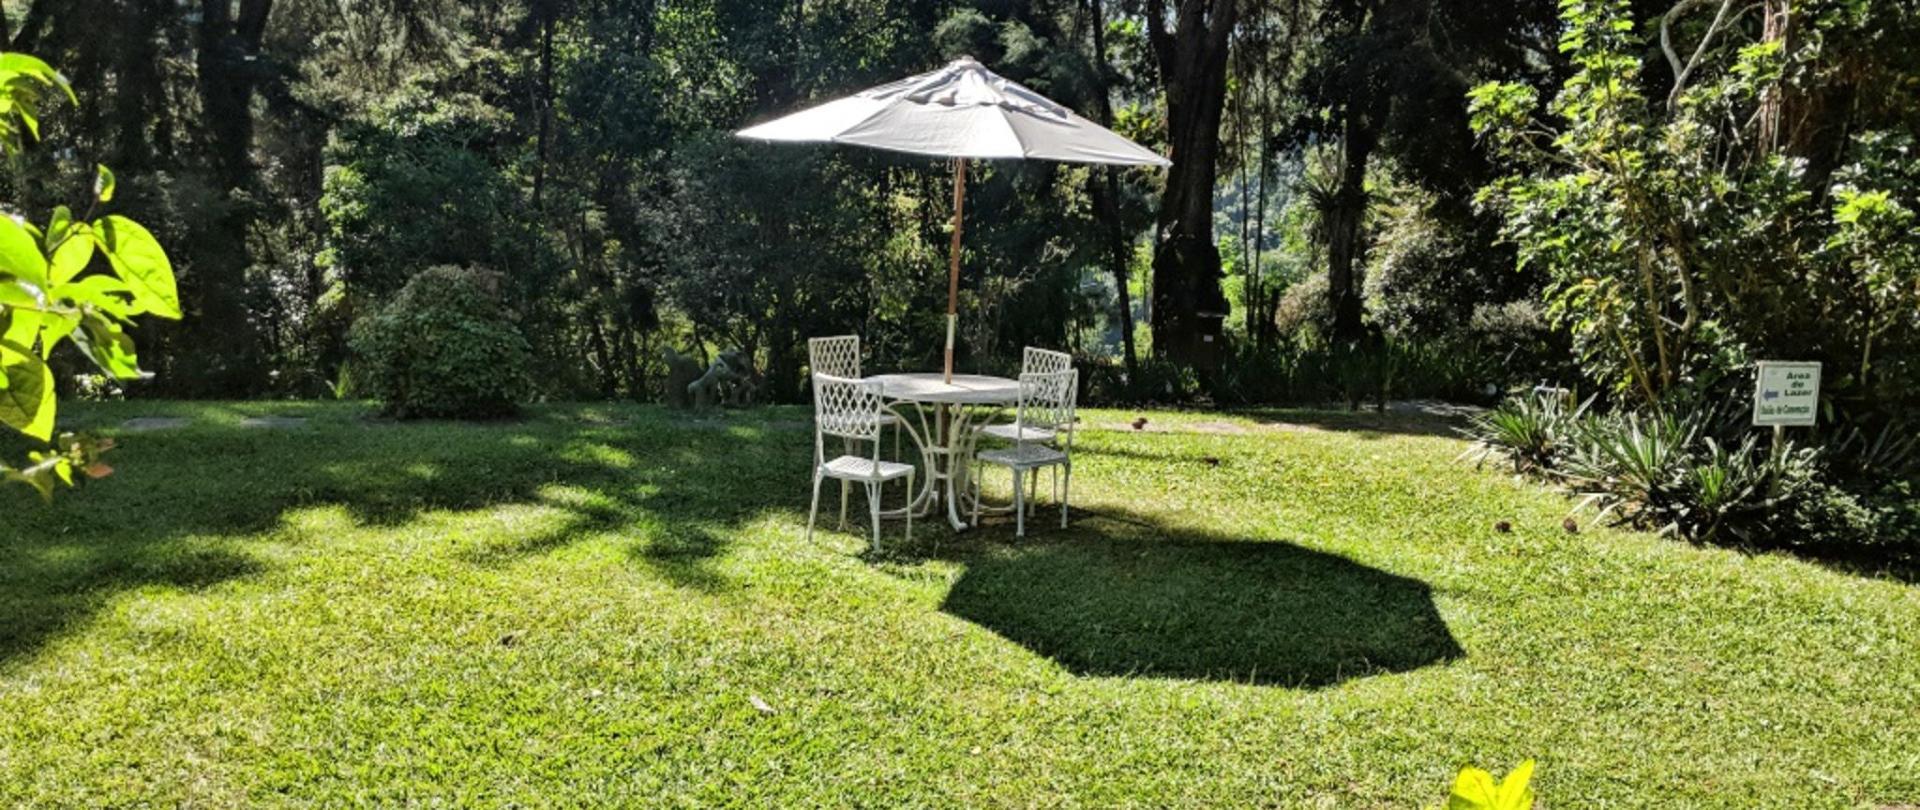 jardim ombrelone HDR.jpg